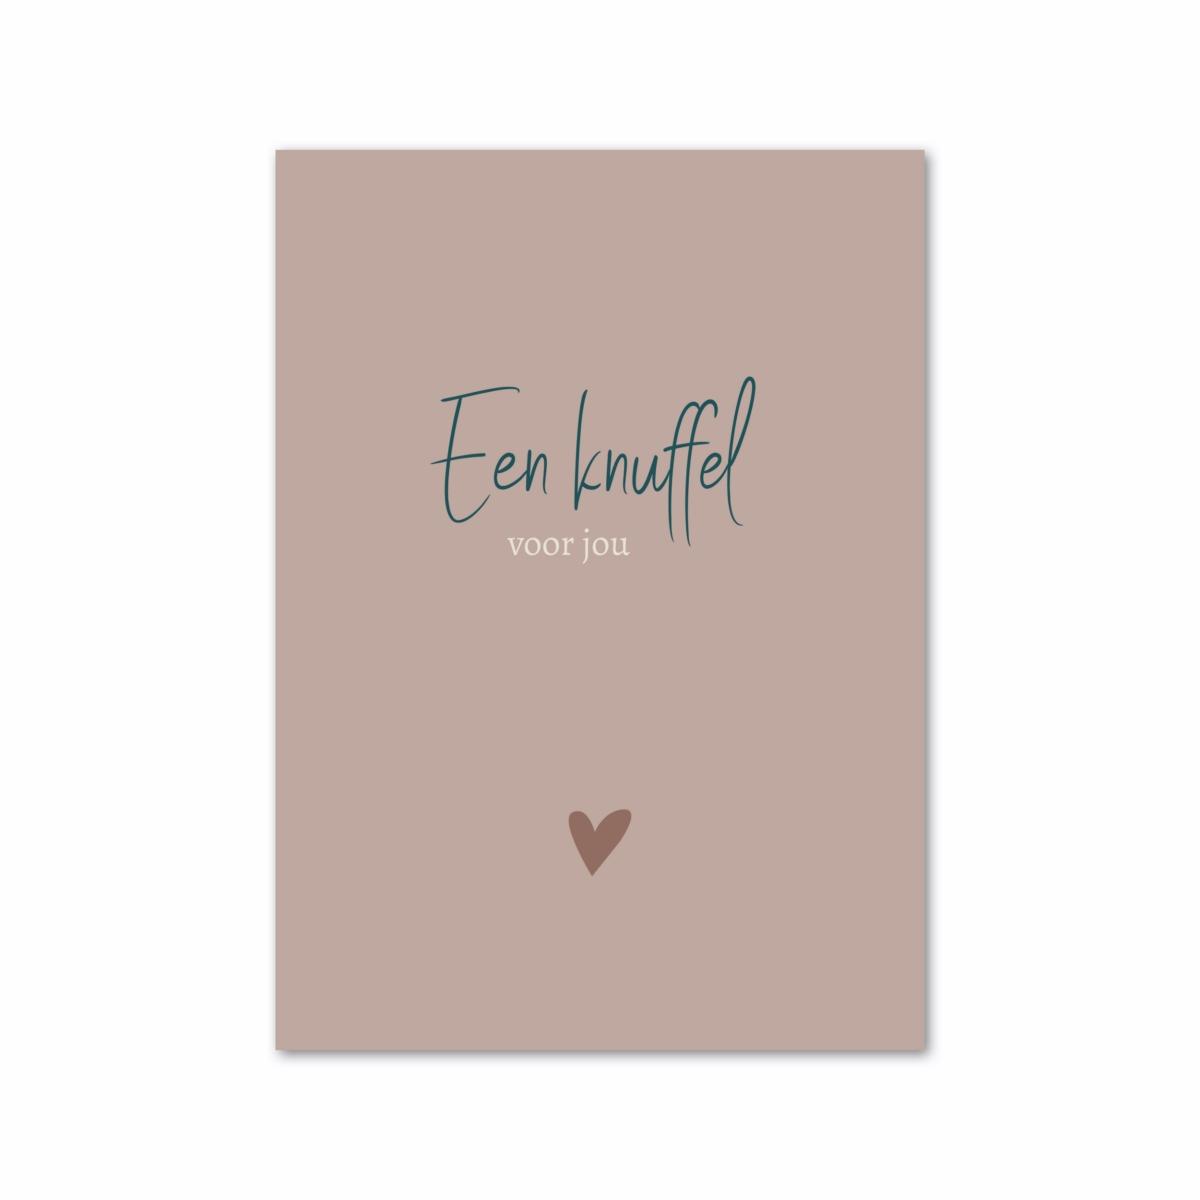 kaart knuffel voor jou